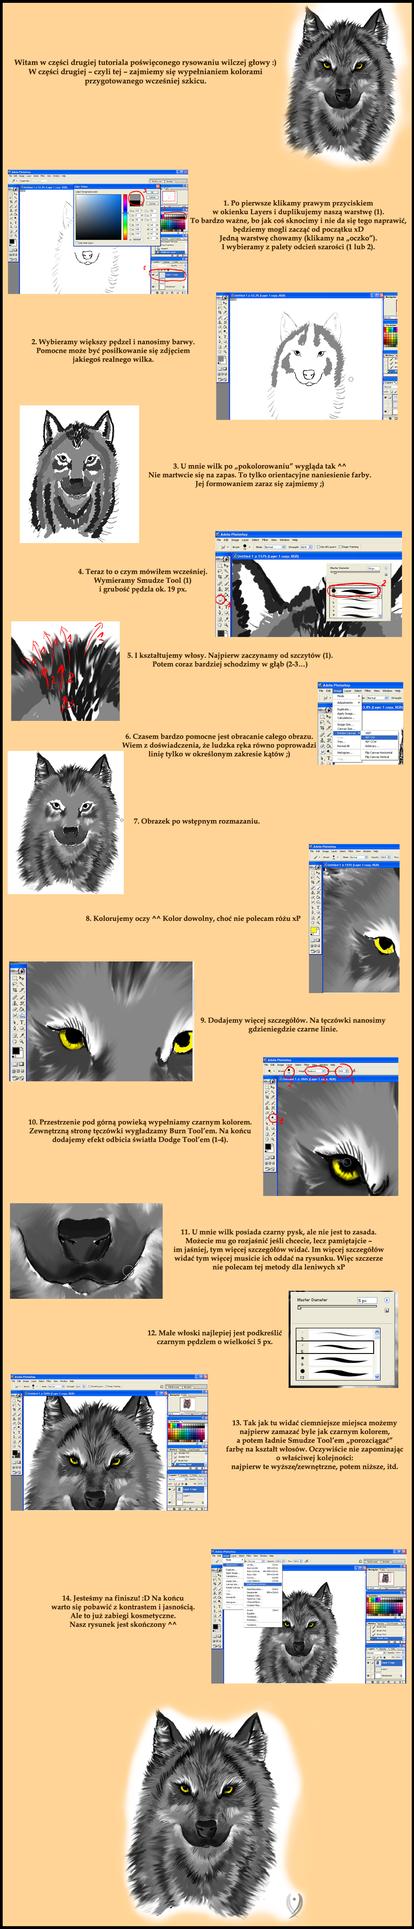 Wolf Head Tutorial part 2 by Pioe